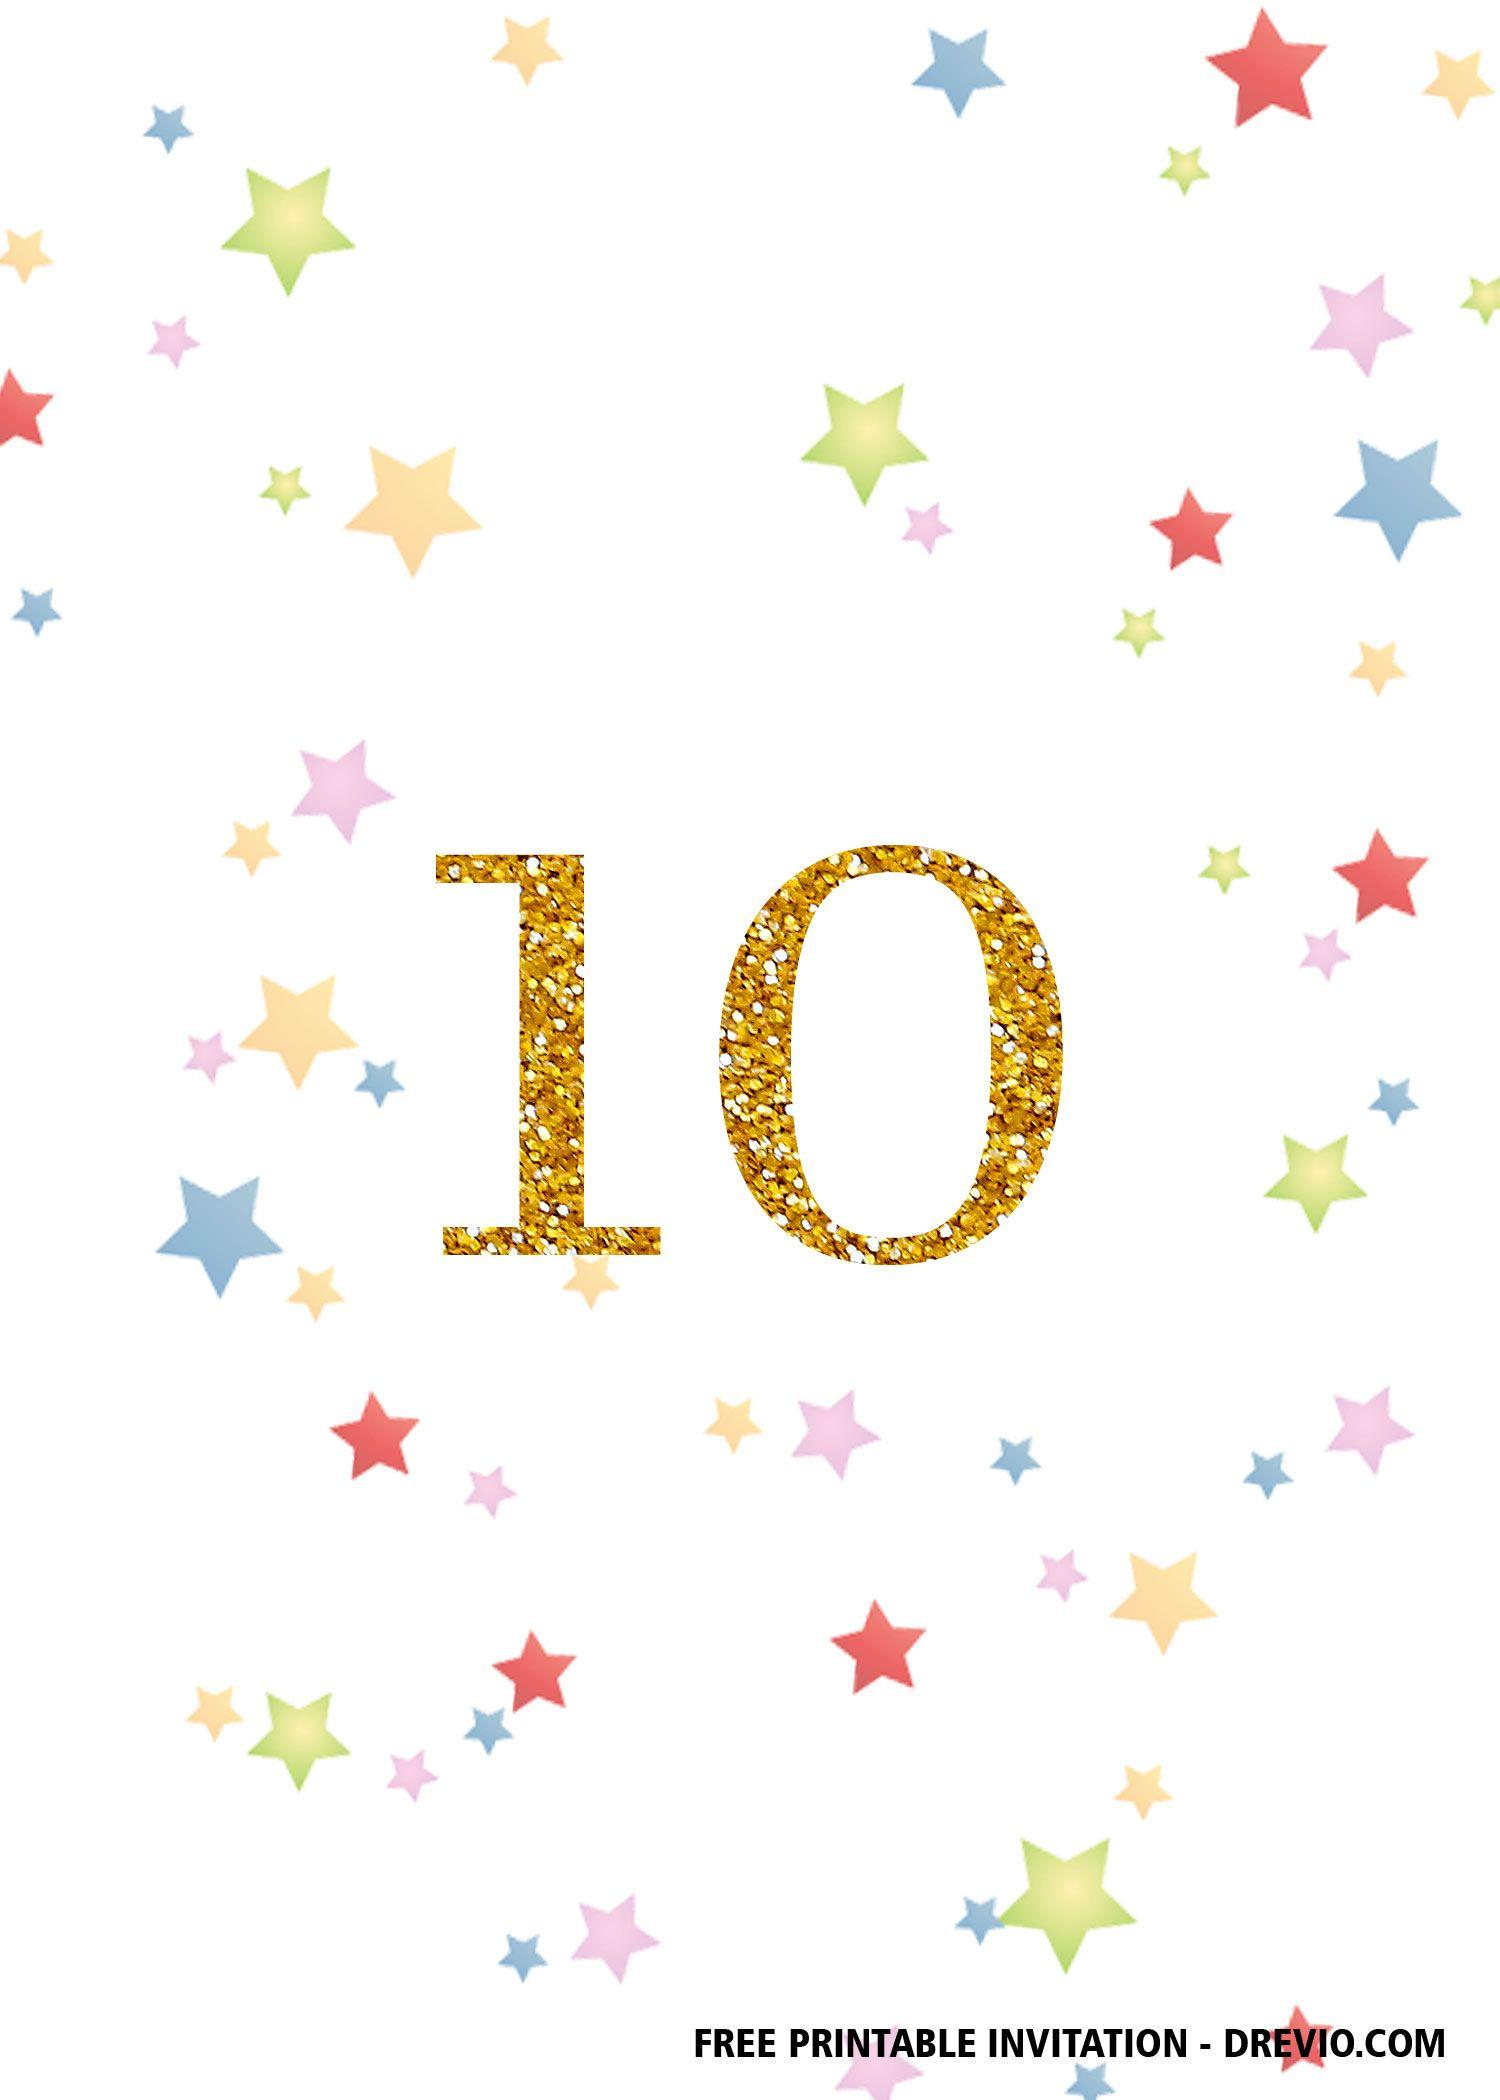 Free Printable 10th Birthday Invitation Templates Printable Birthday Invitations Free Printable Birthday Invitations 10th Birthday Invitation